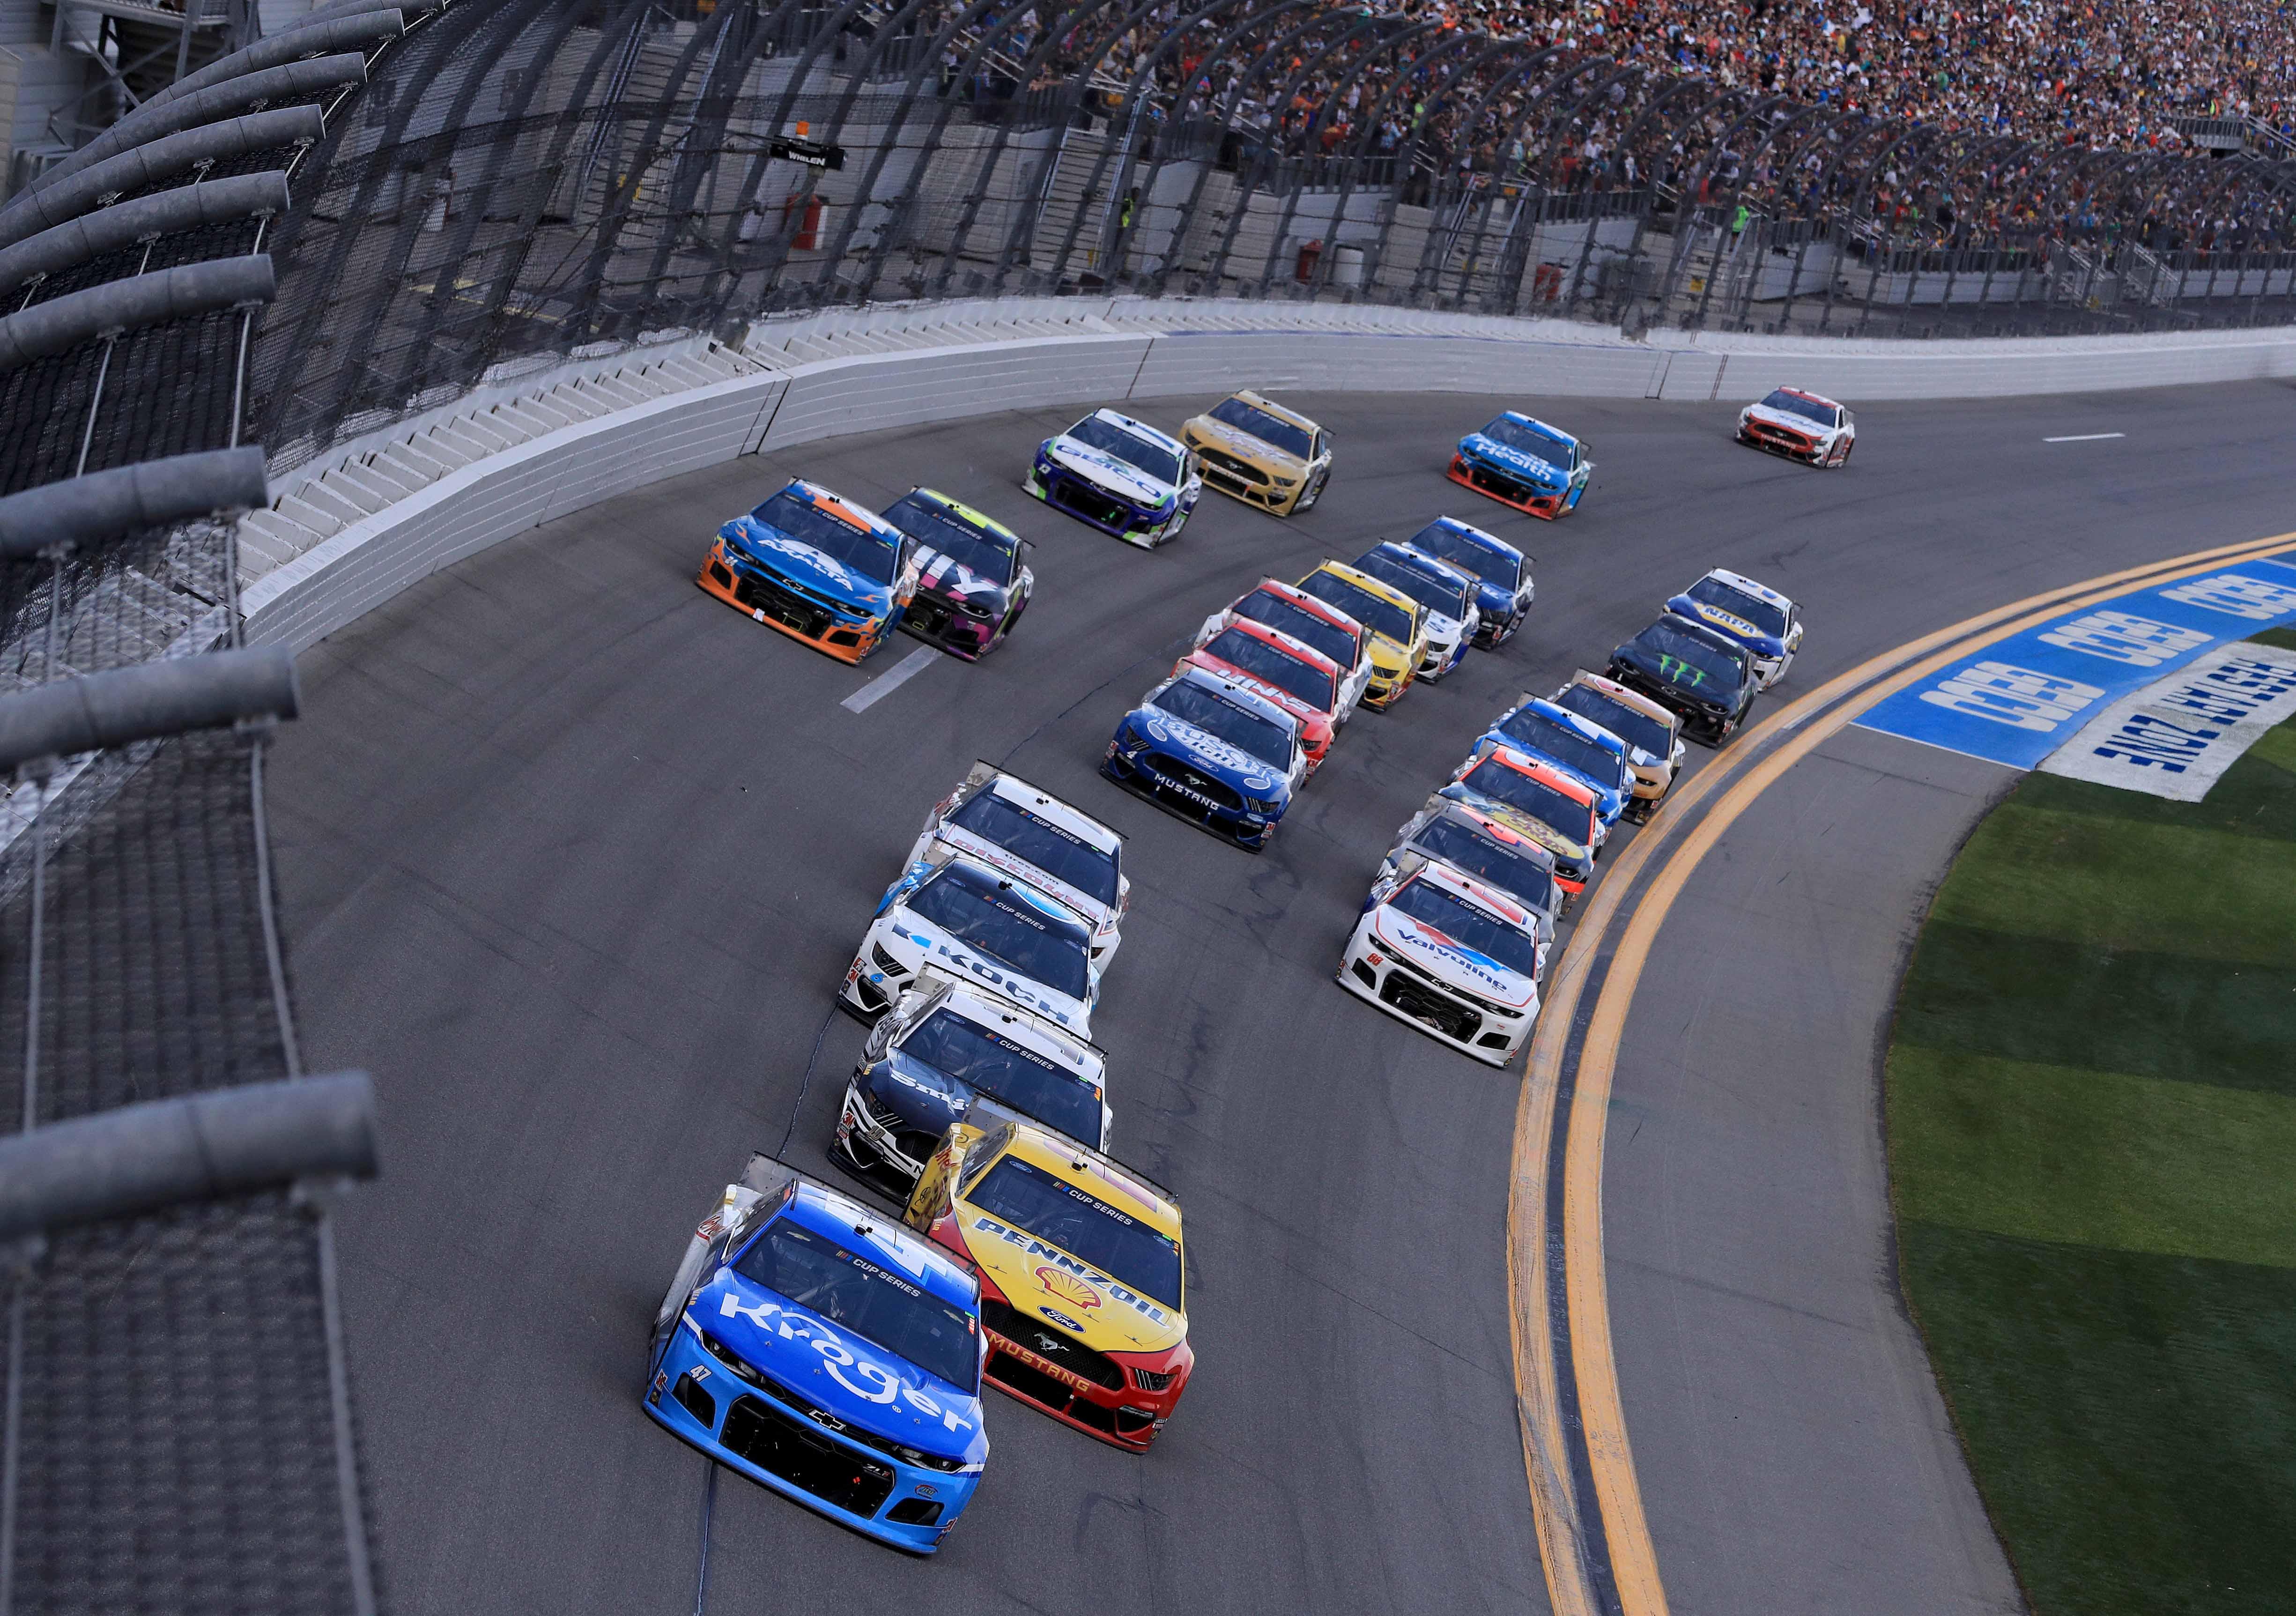 Ricky Stenhouse Jr leads Joey Logano in the Daytona 500 - NASCAR Cup Series